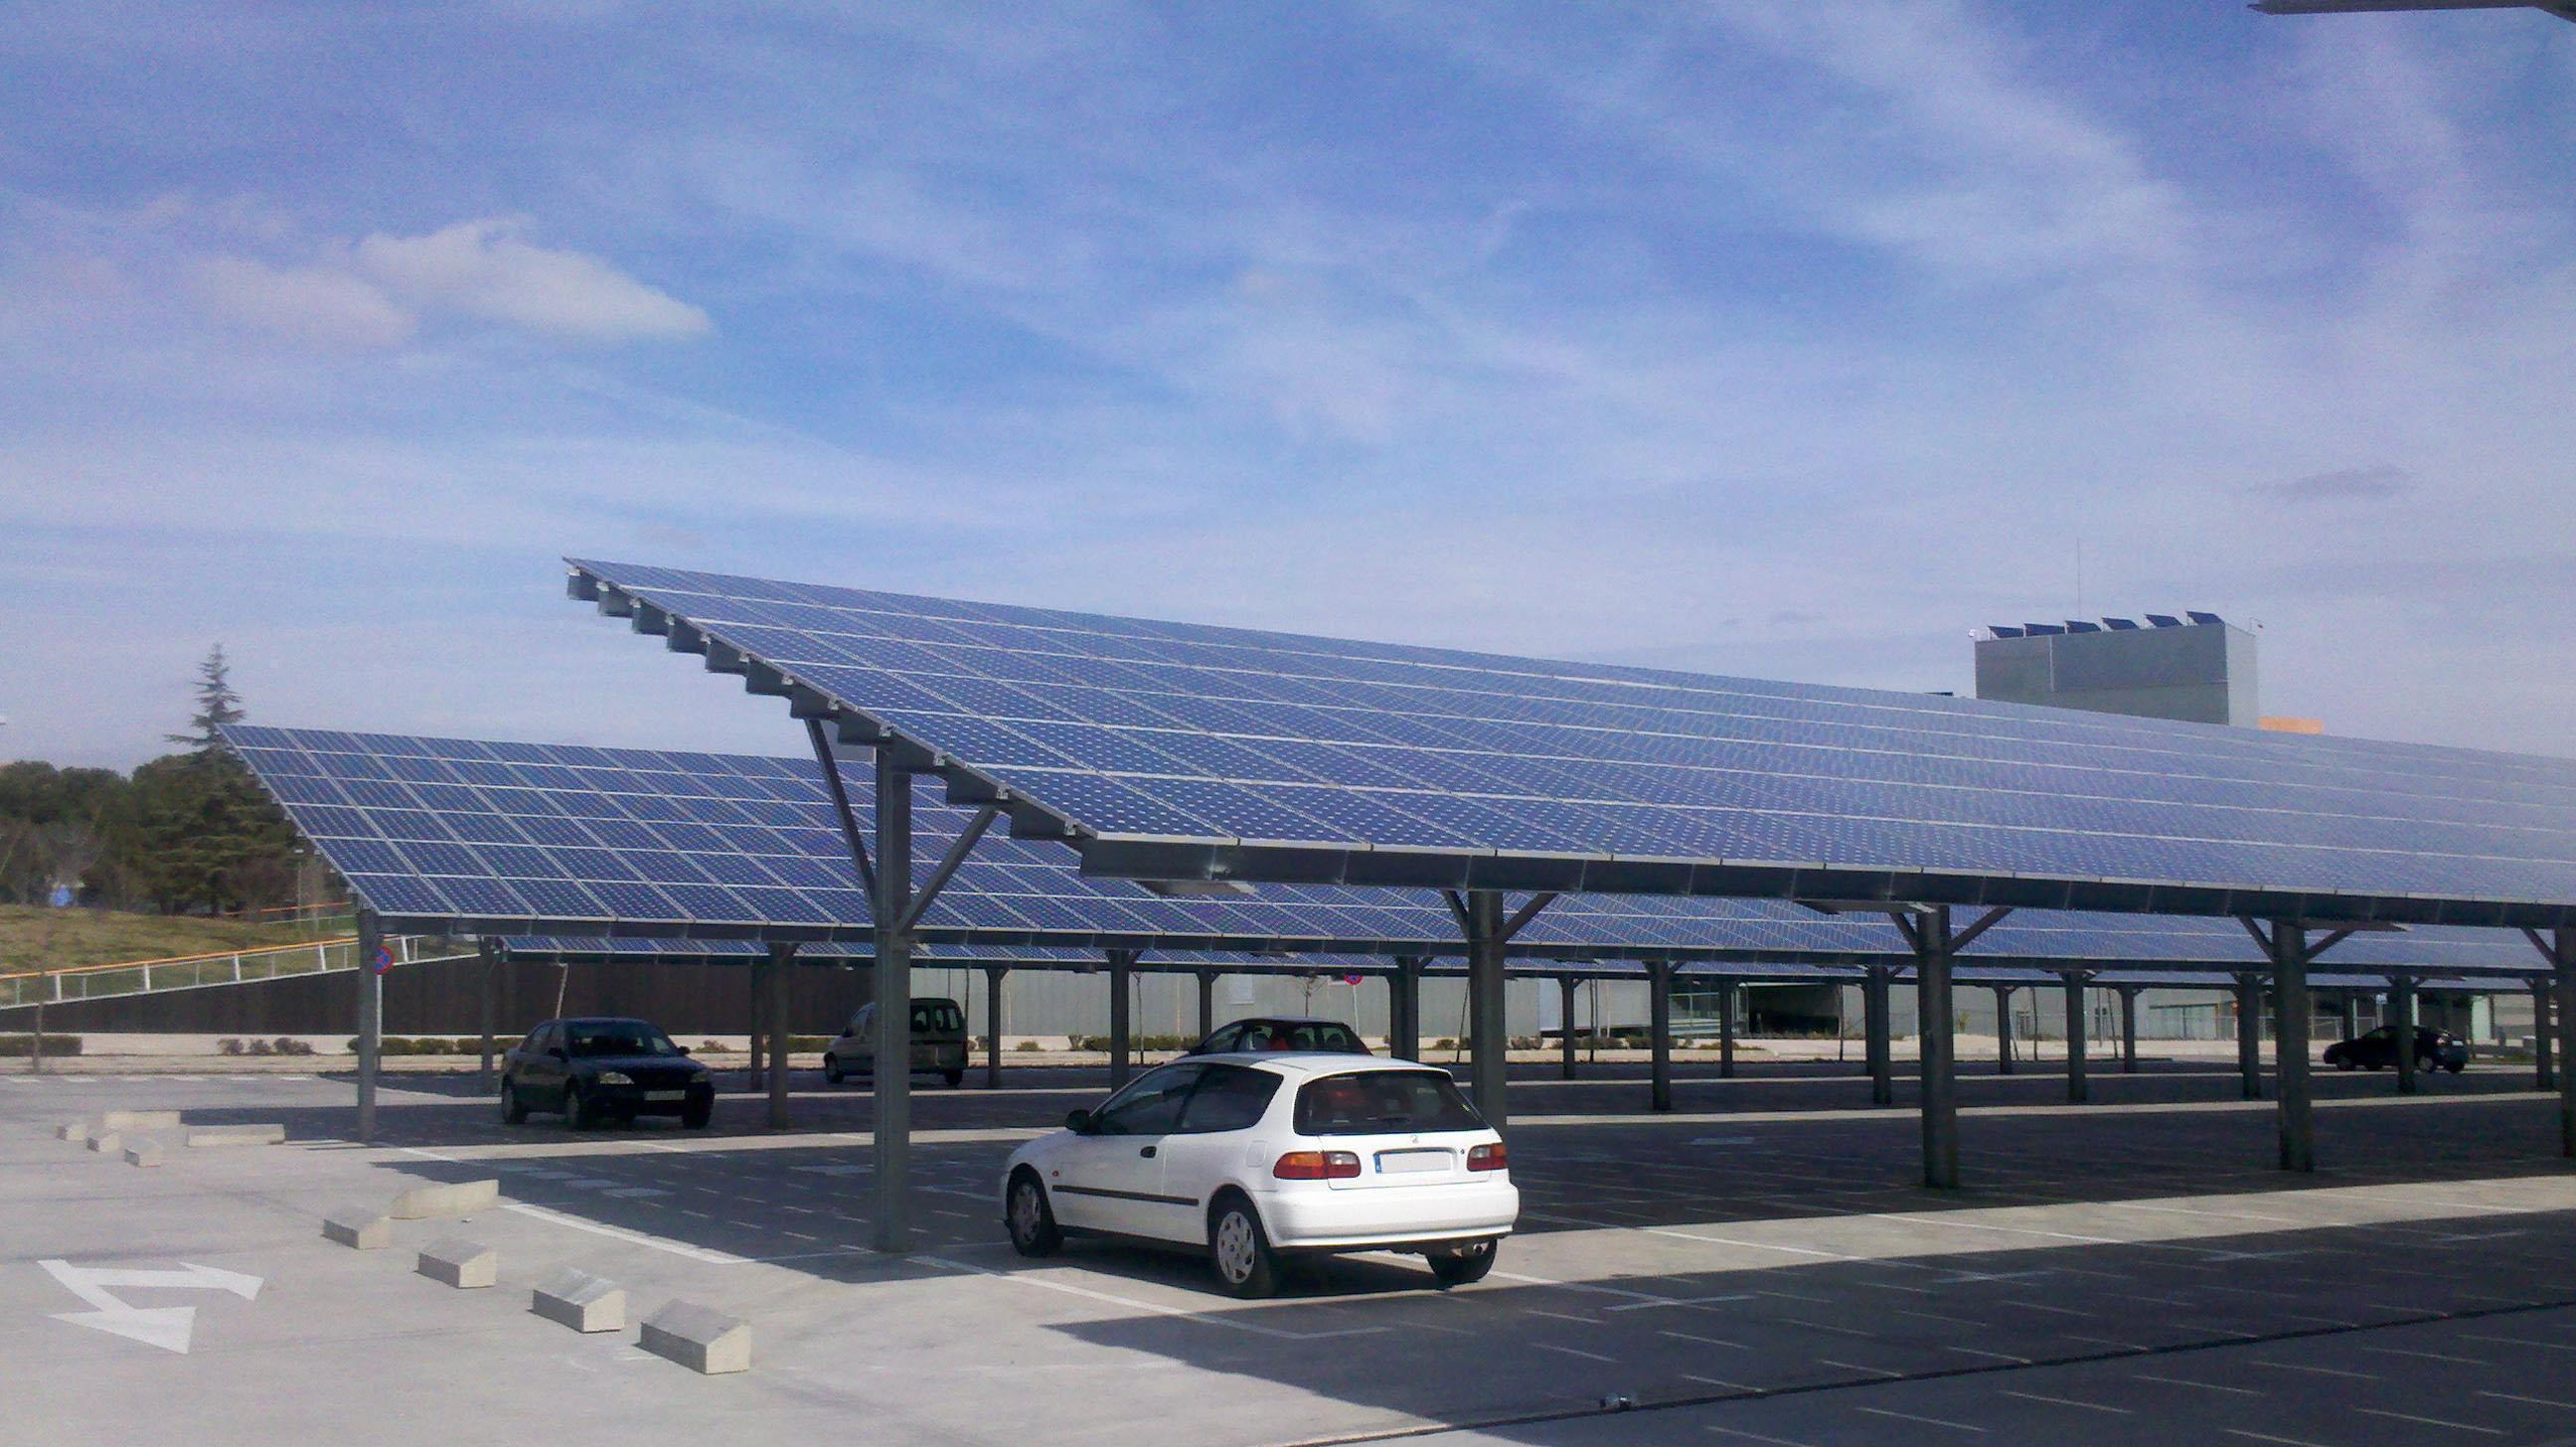 FilePV solar parking.jpg & File:PV solar parking.jpg - Wikimedia Commons